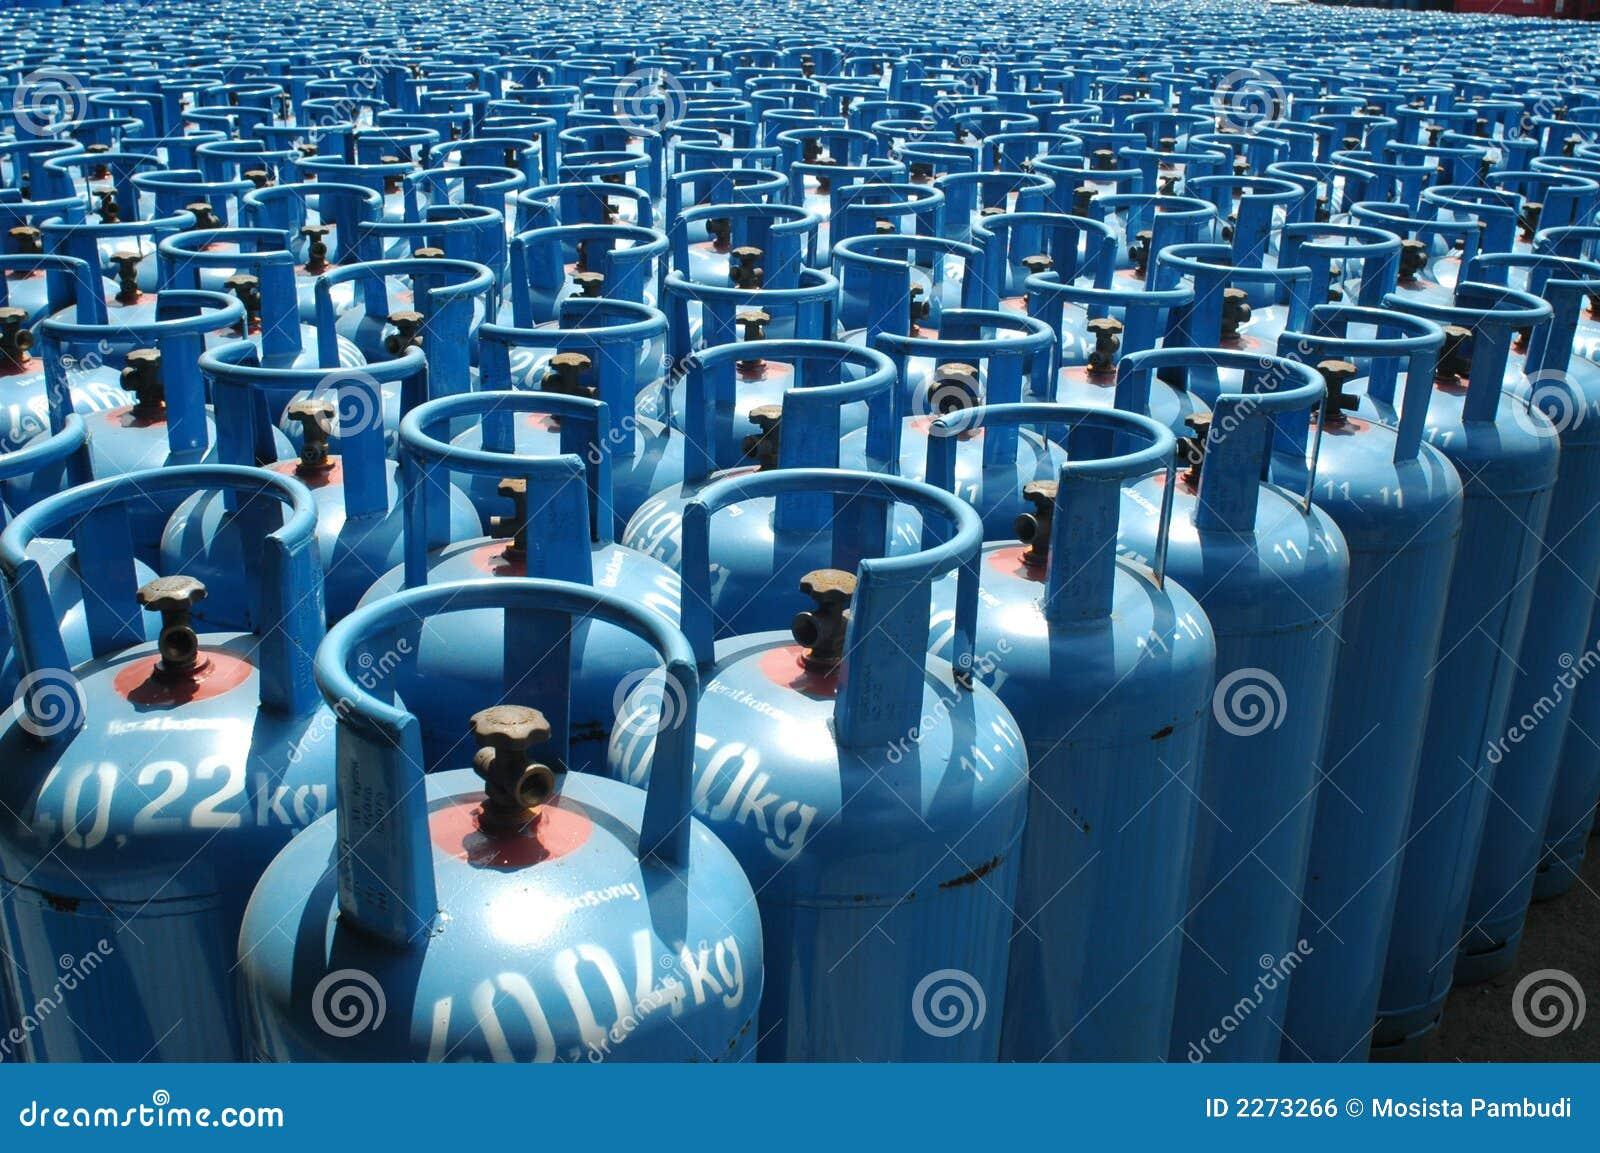 Liquid Petroleum Gas Royalty Free Stock Image - Image: 2273266